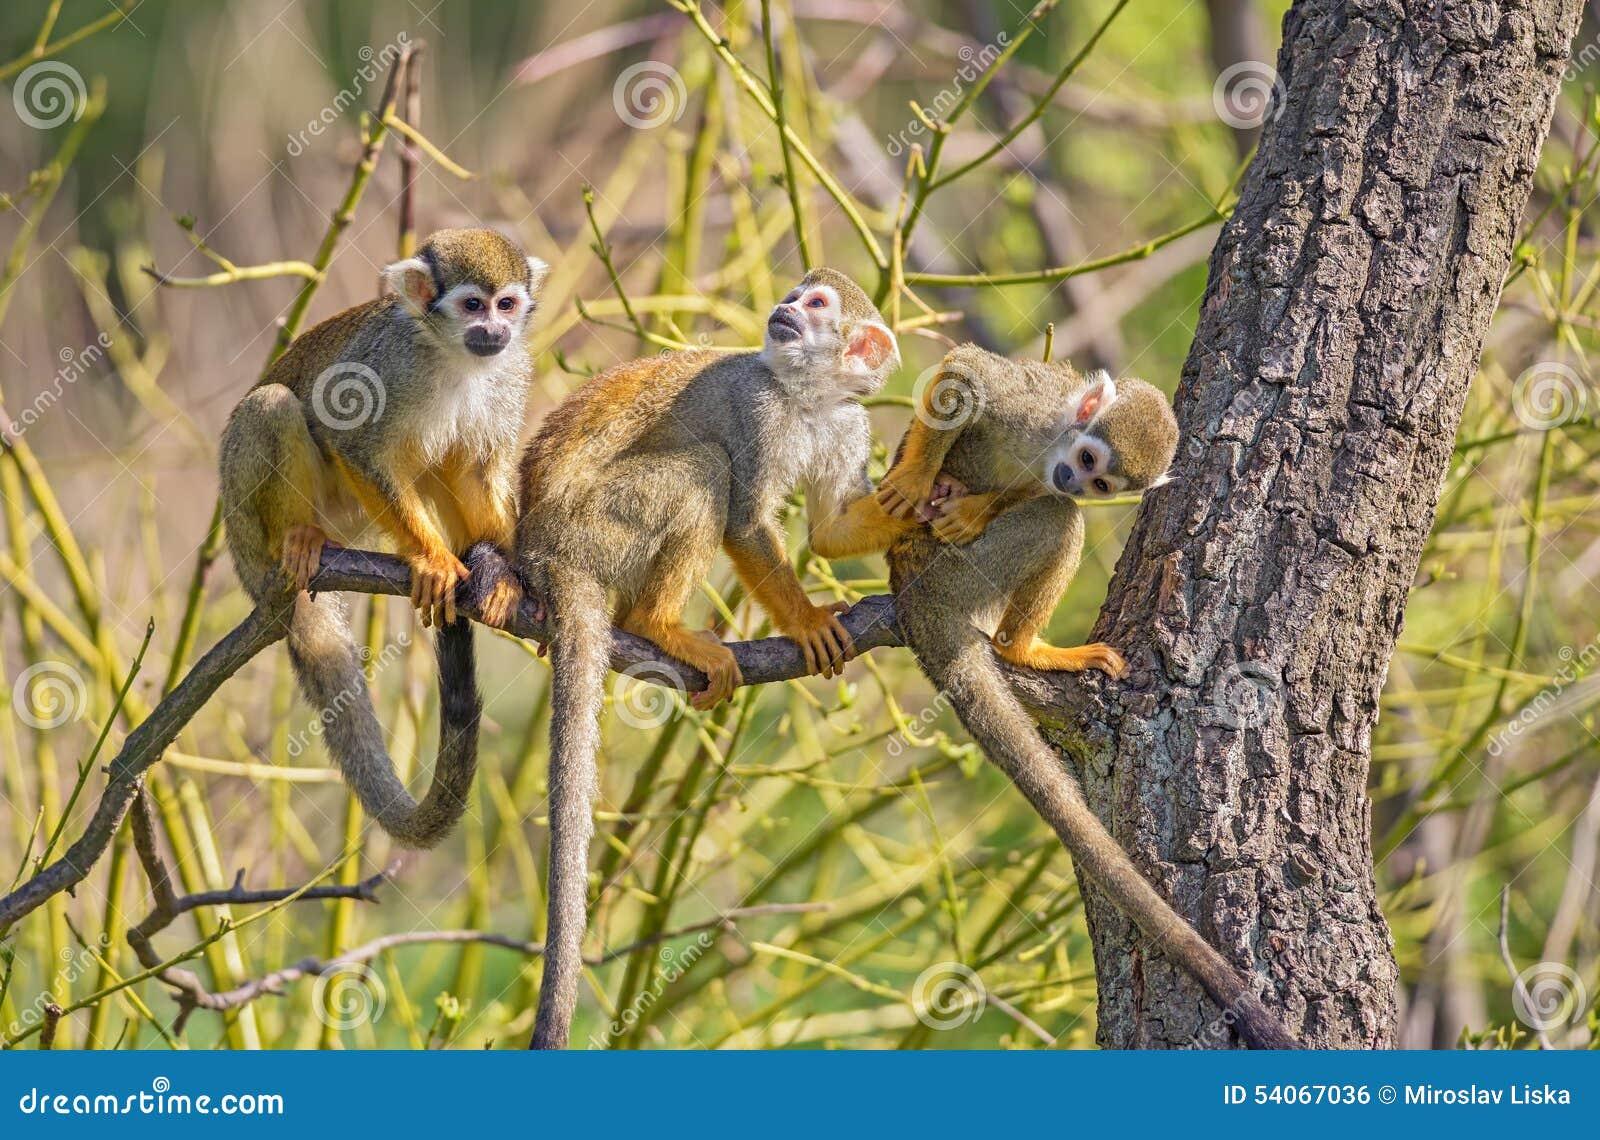 Squirrel monkeys in trees - photo#47